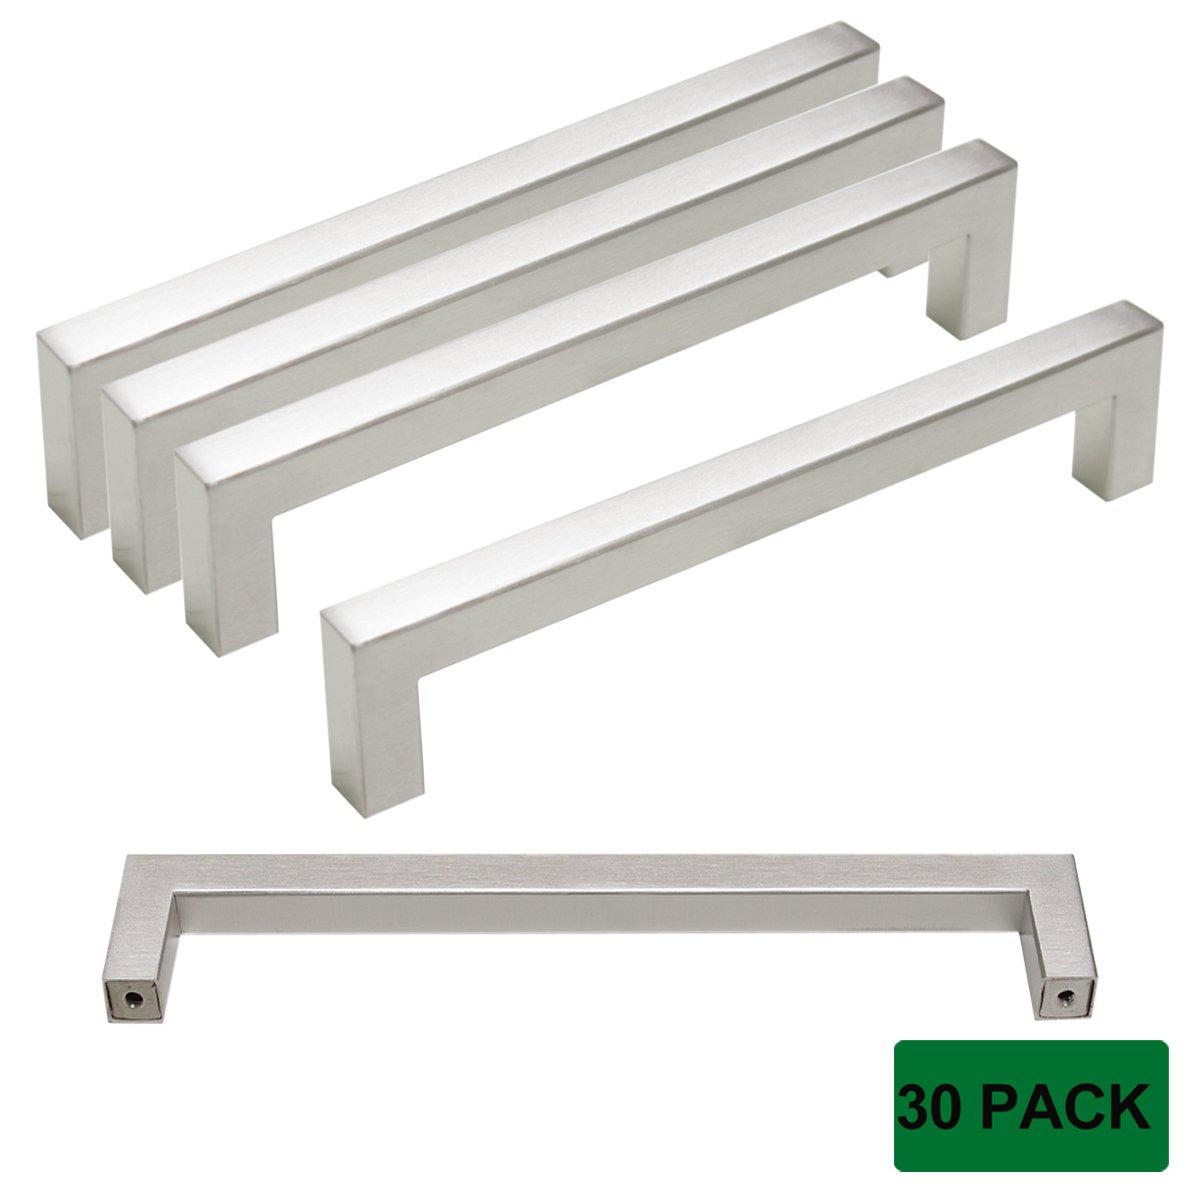 Probrico 30 Pack 6-3/10'' (160mm) Center to Center Kitchen Cabinet Pulls Stainless Steel Cupboard Drawer Dresser Modern Brushed Nickel Bar Pulls